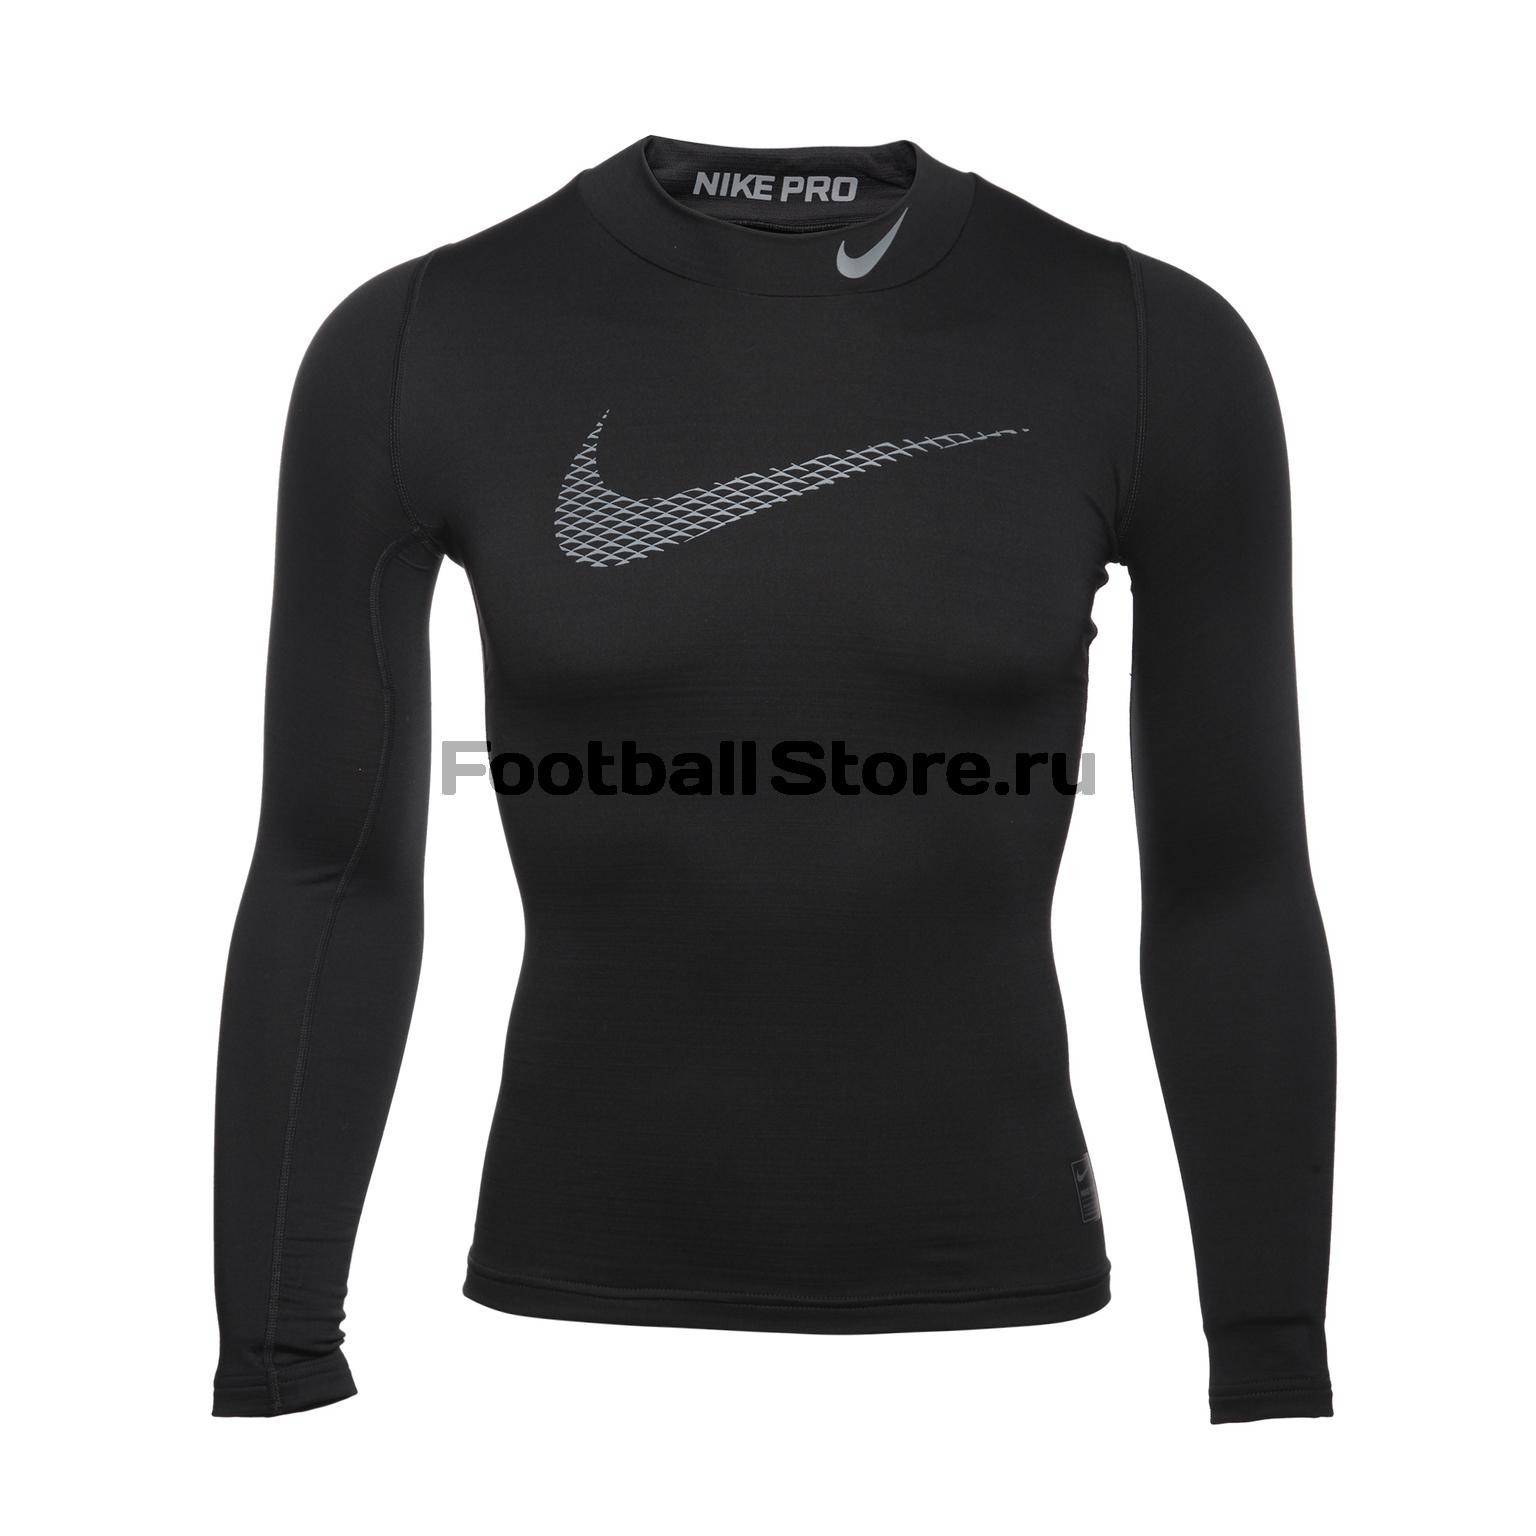 Белье футболка подростковая Nike Warm 856134-010